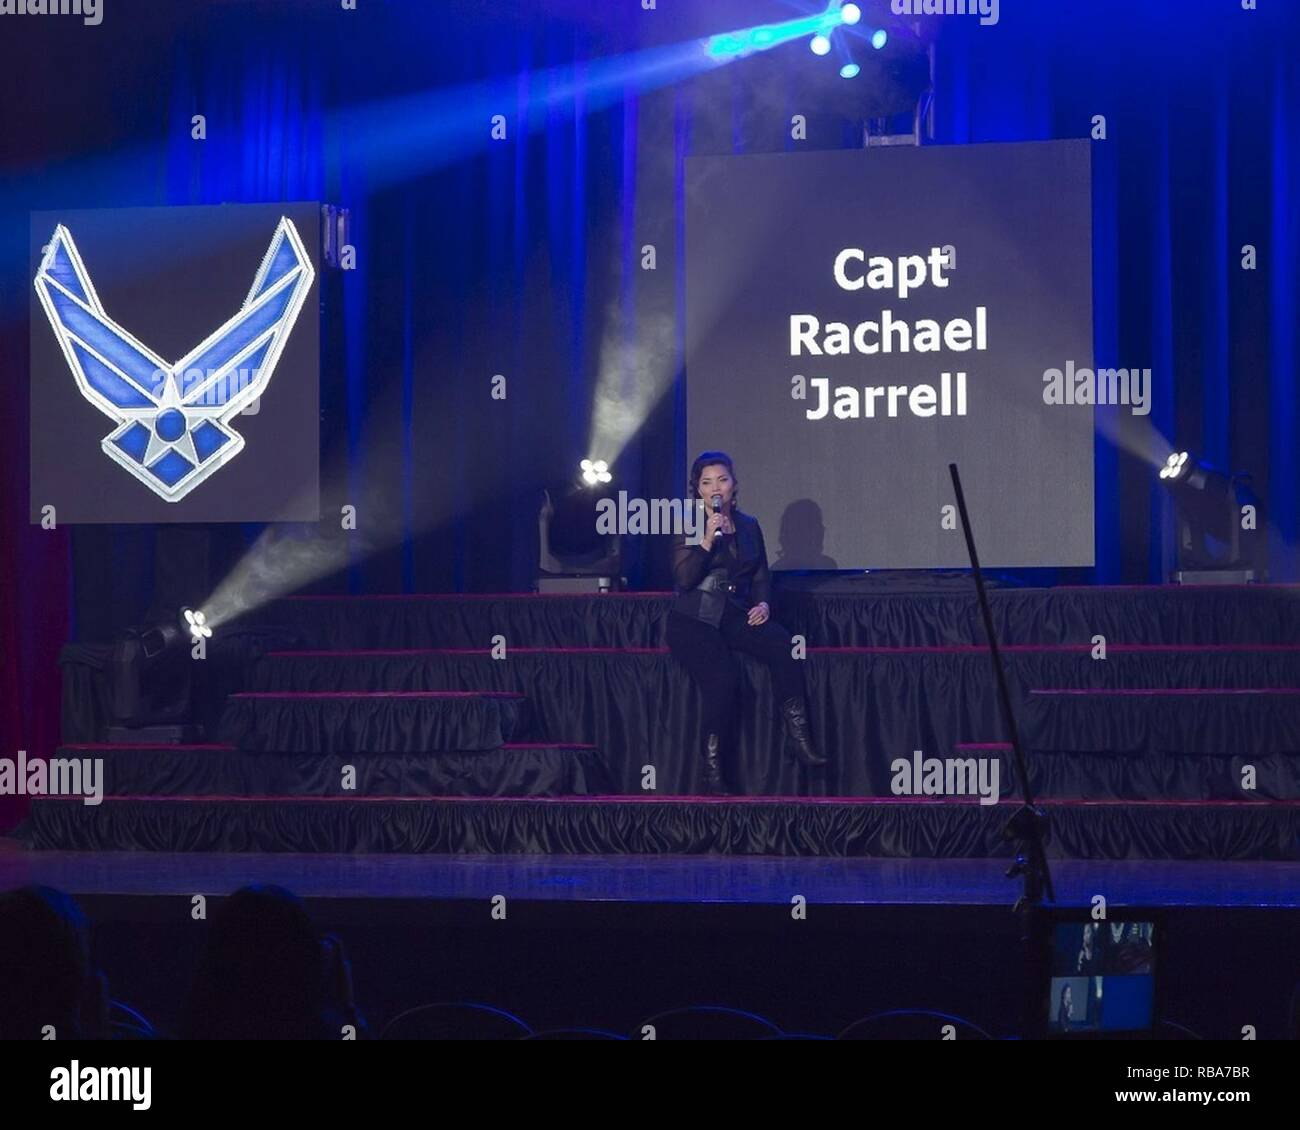 Capt  Rachael Jarrell of the 7th Logistics Readiness